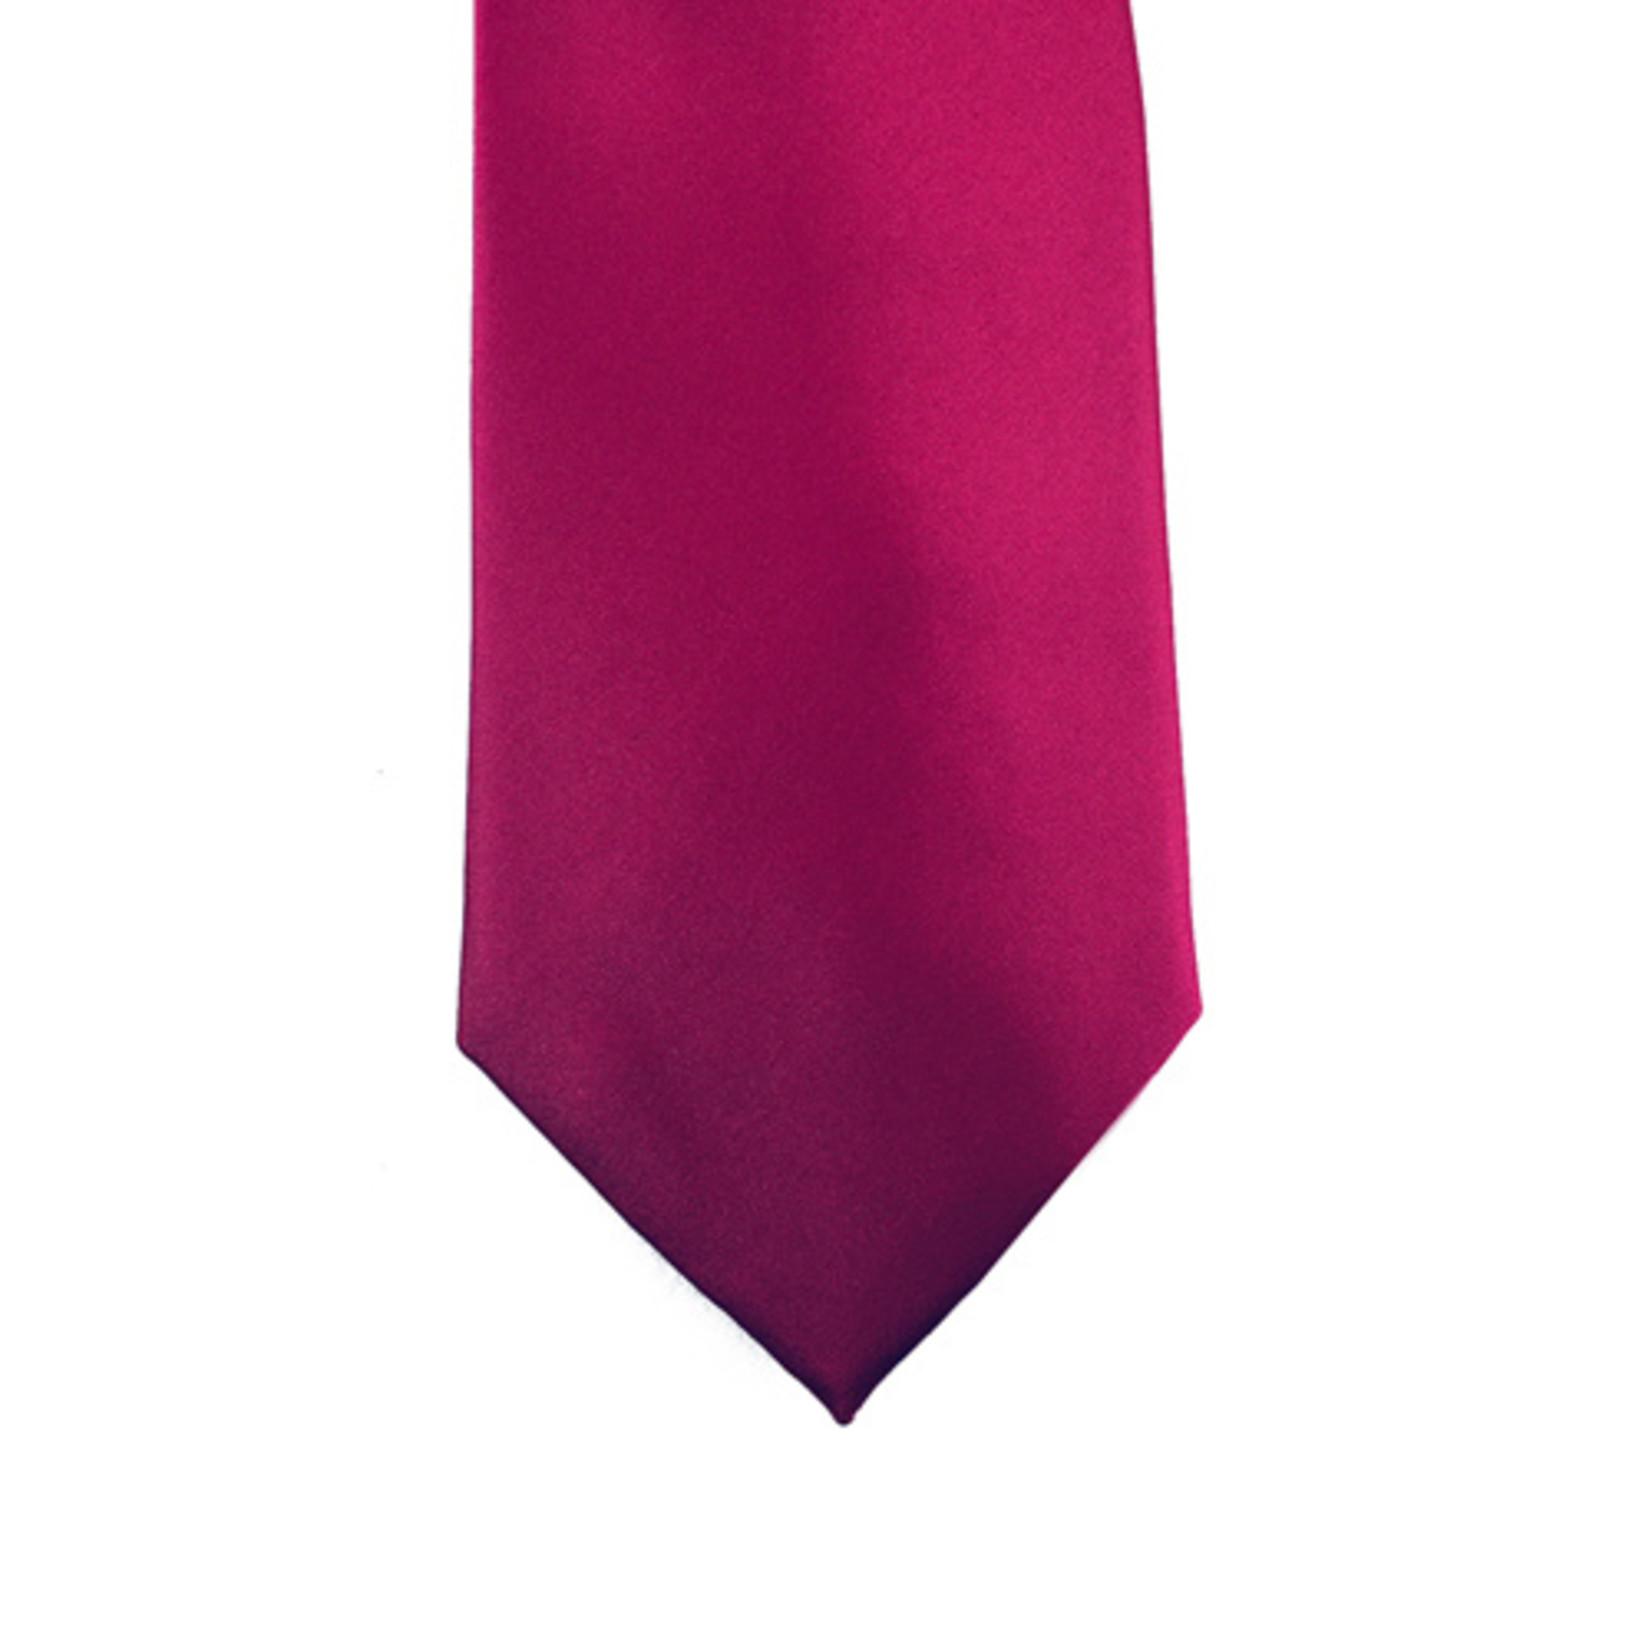 Knotz M100-24 Solid Fuchsia Tie